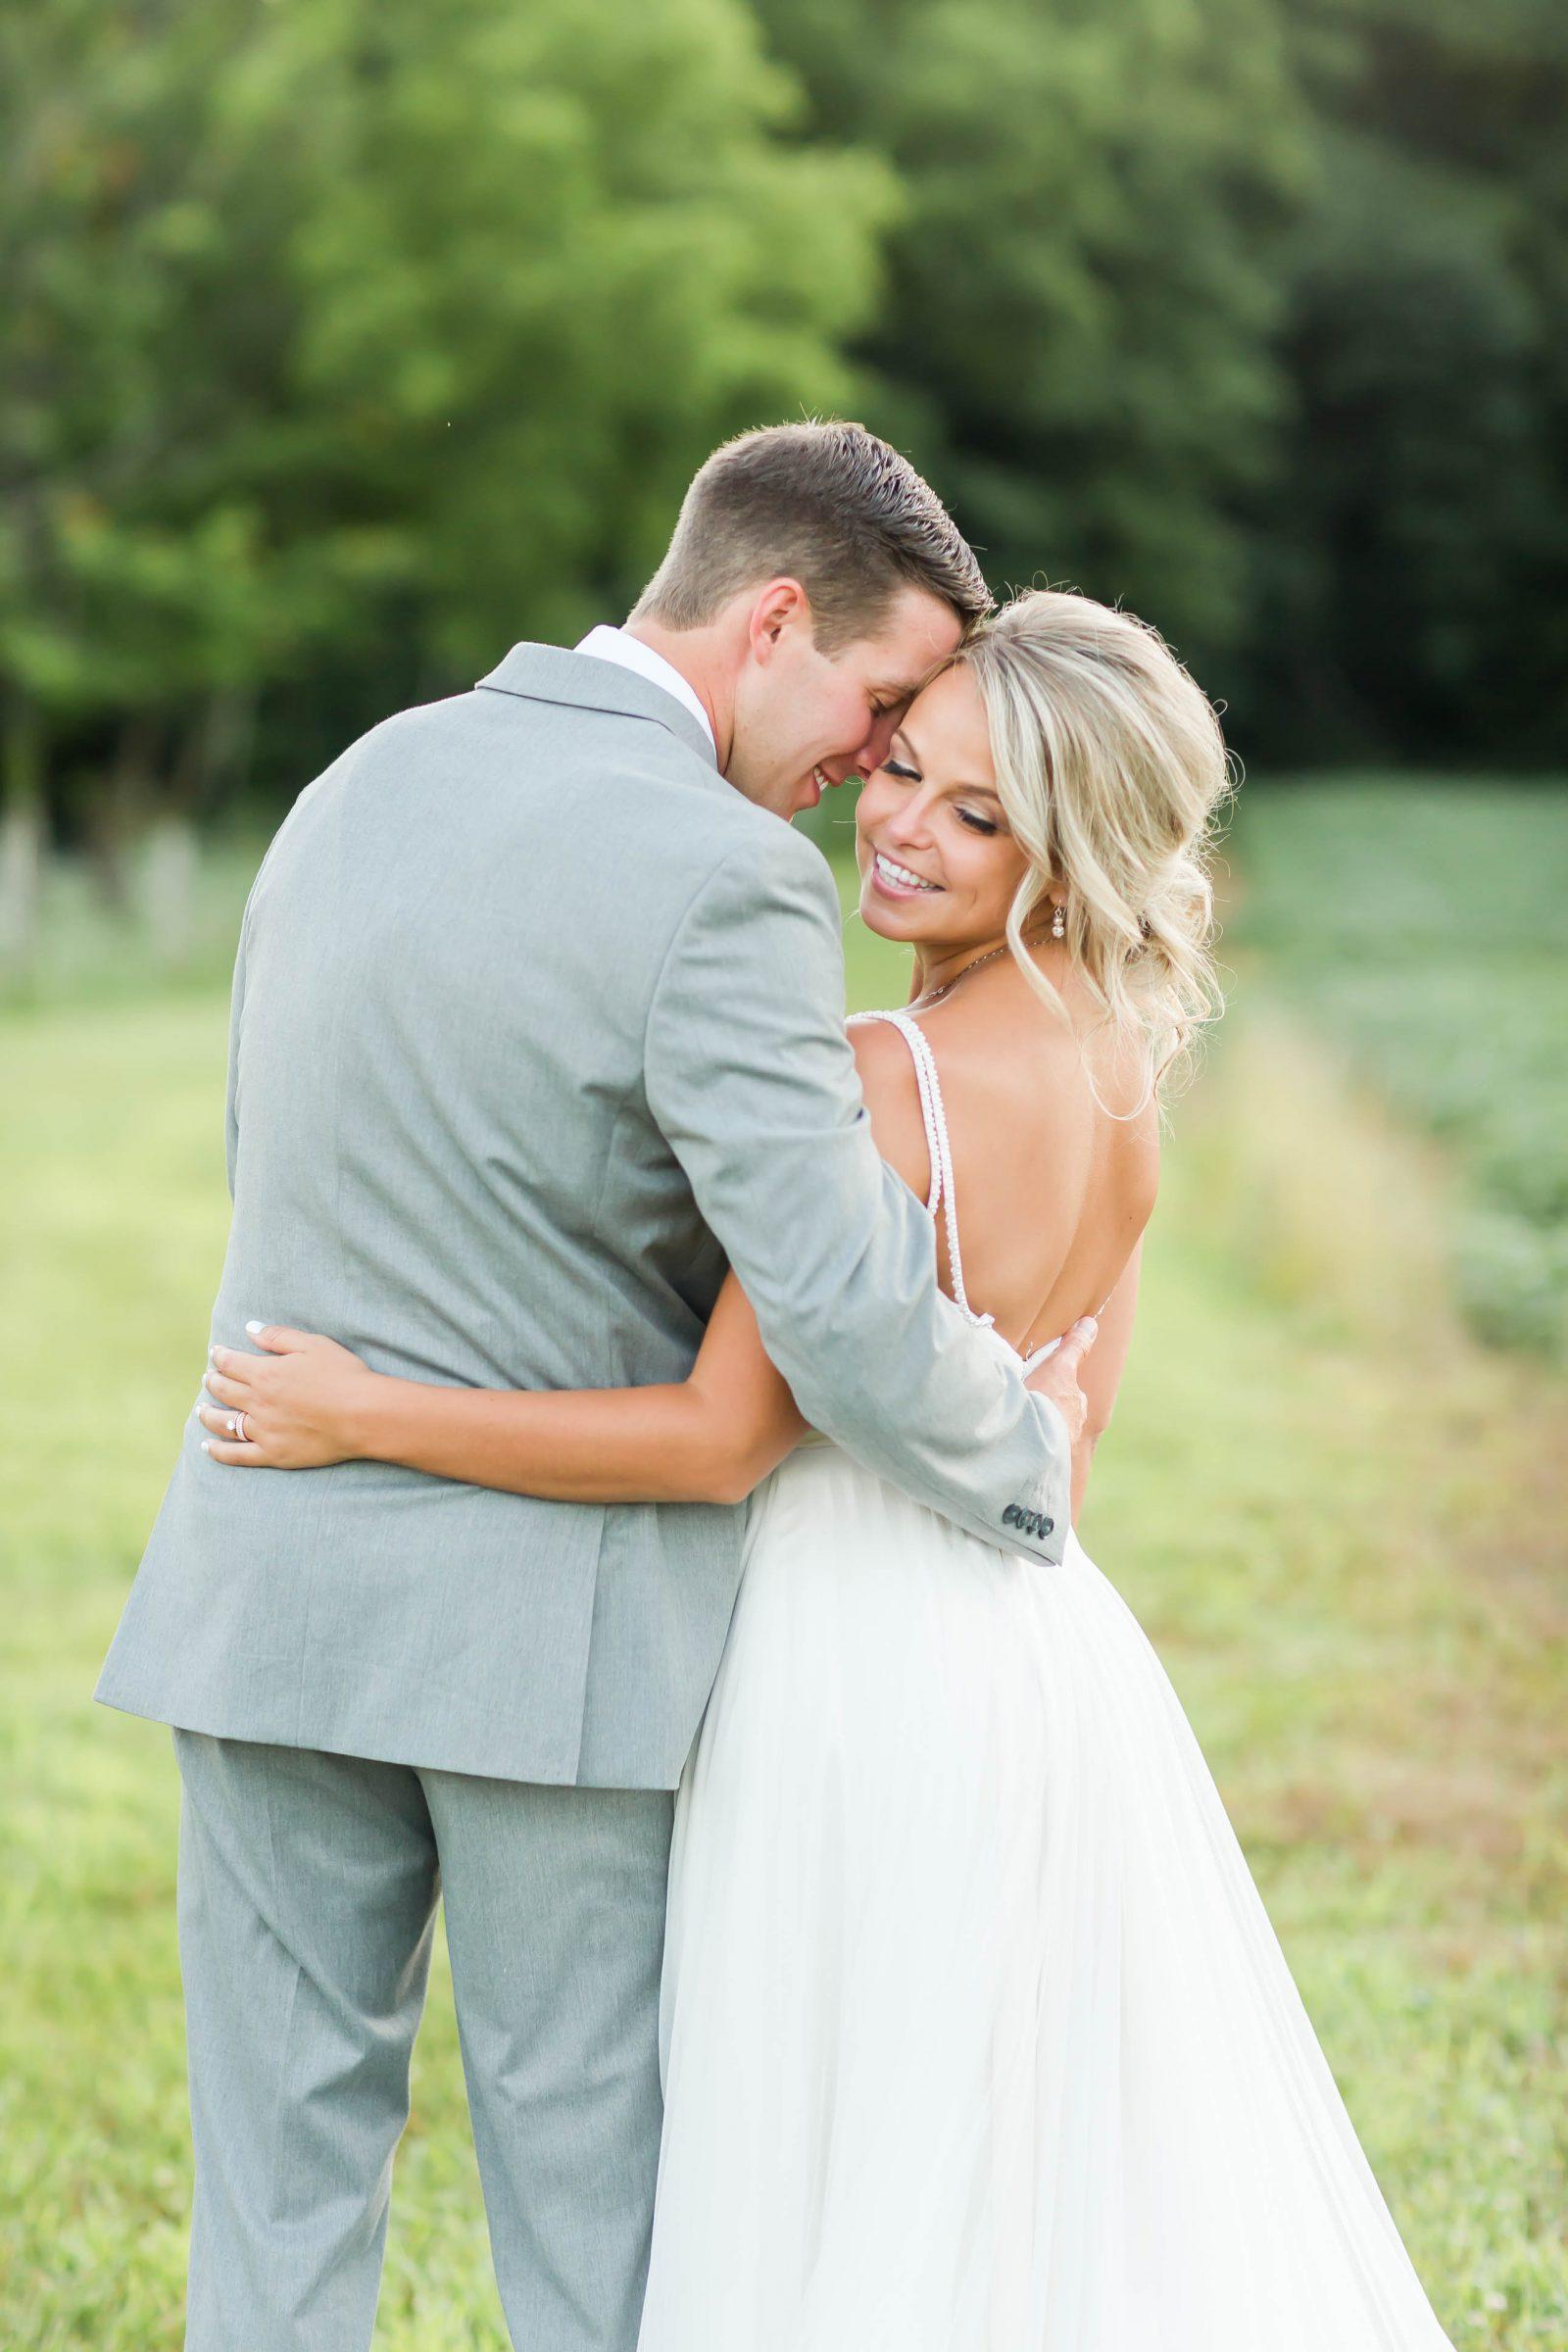 peacock-ridge-summer-wedding-photographer-akron-ohio-loren-jackson-photography-126